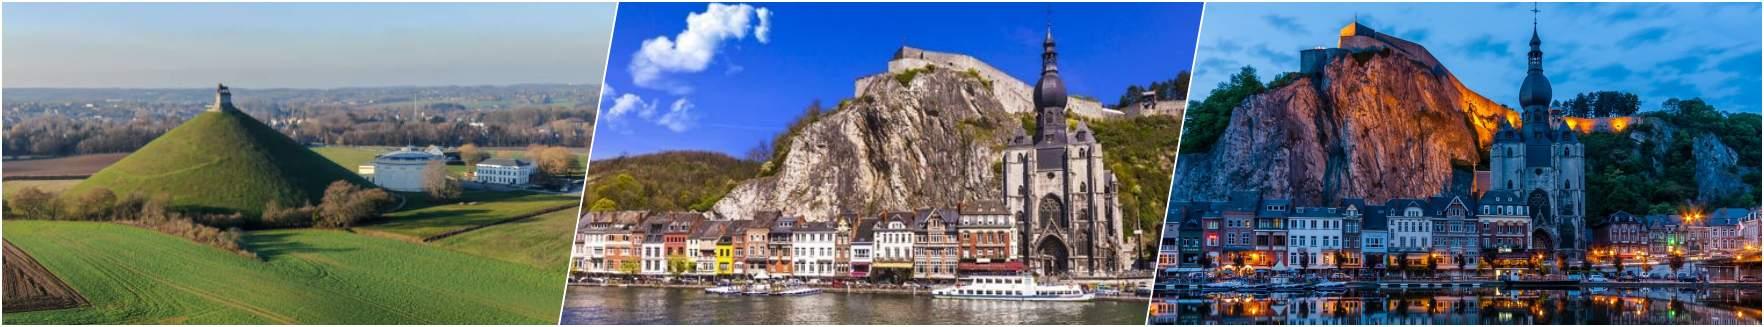 Waterloo - Namur - Dinant